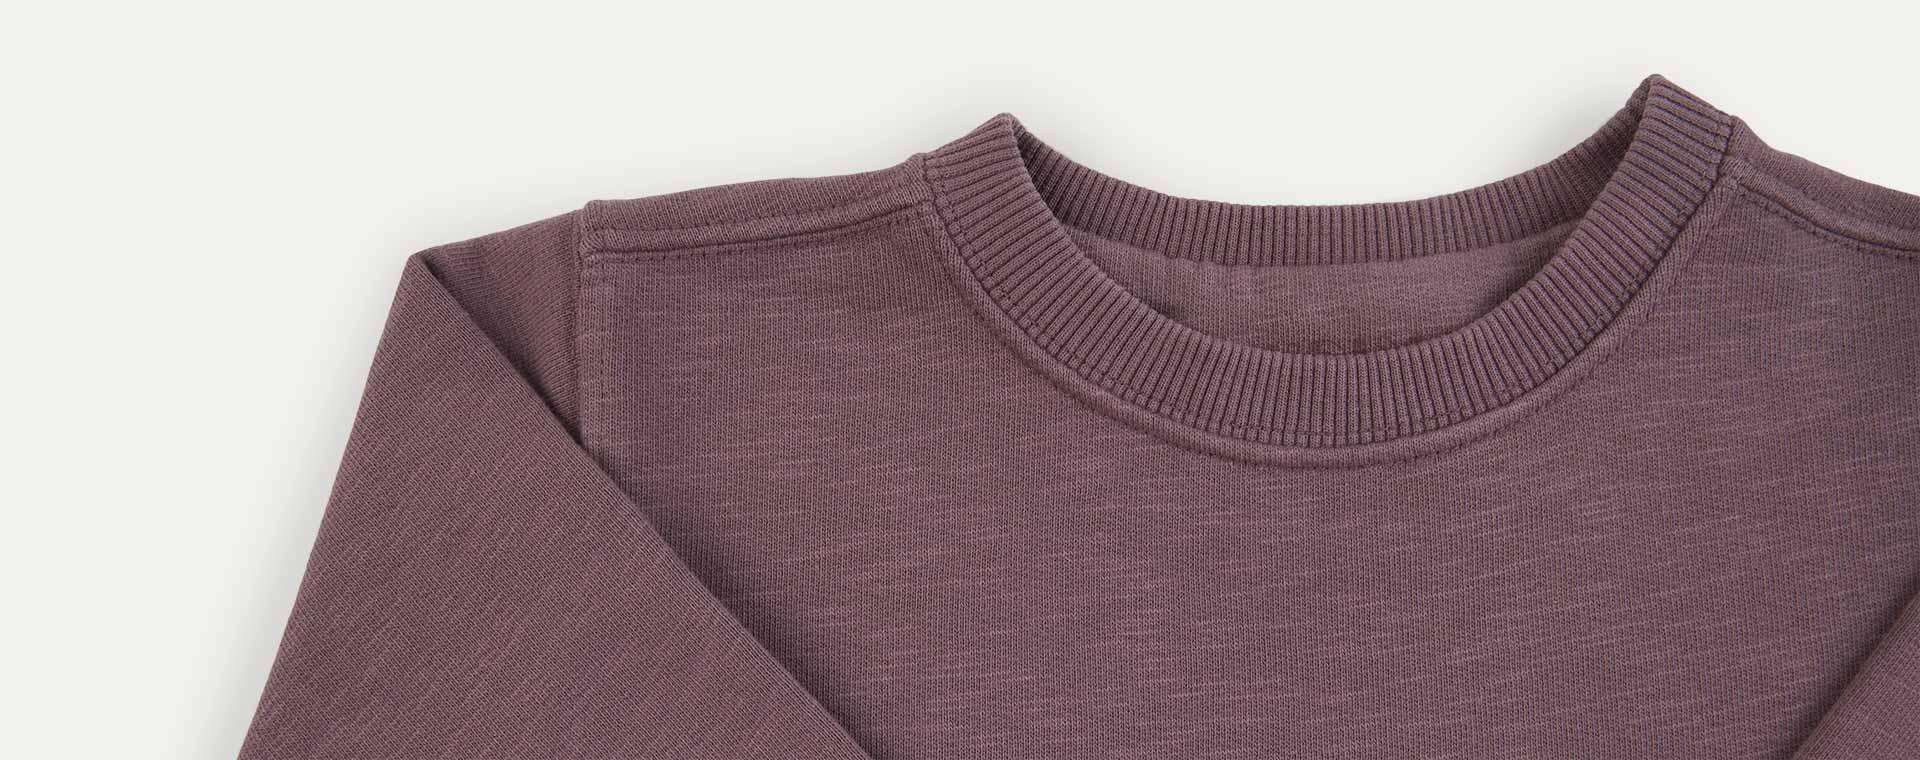 Damson KIDLY Label Organic Sweatshirt Dress